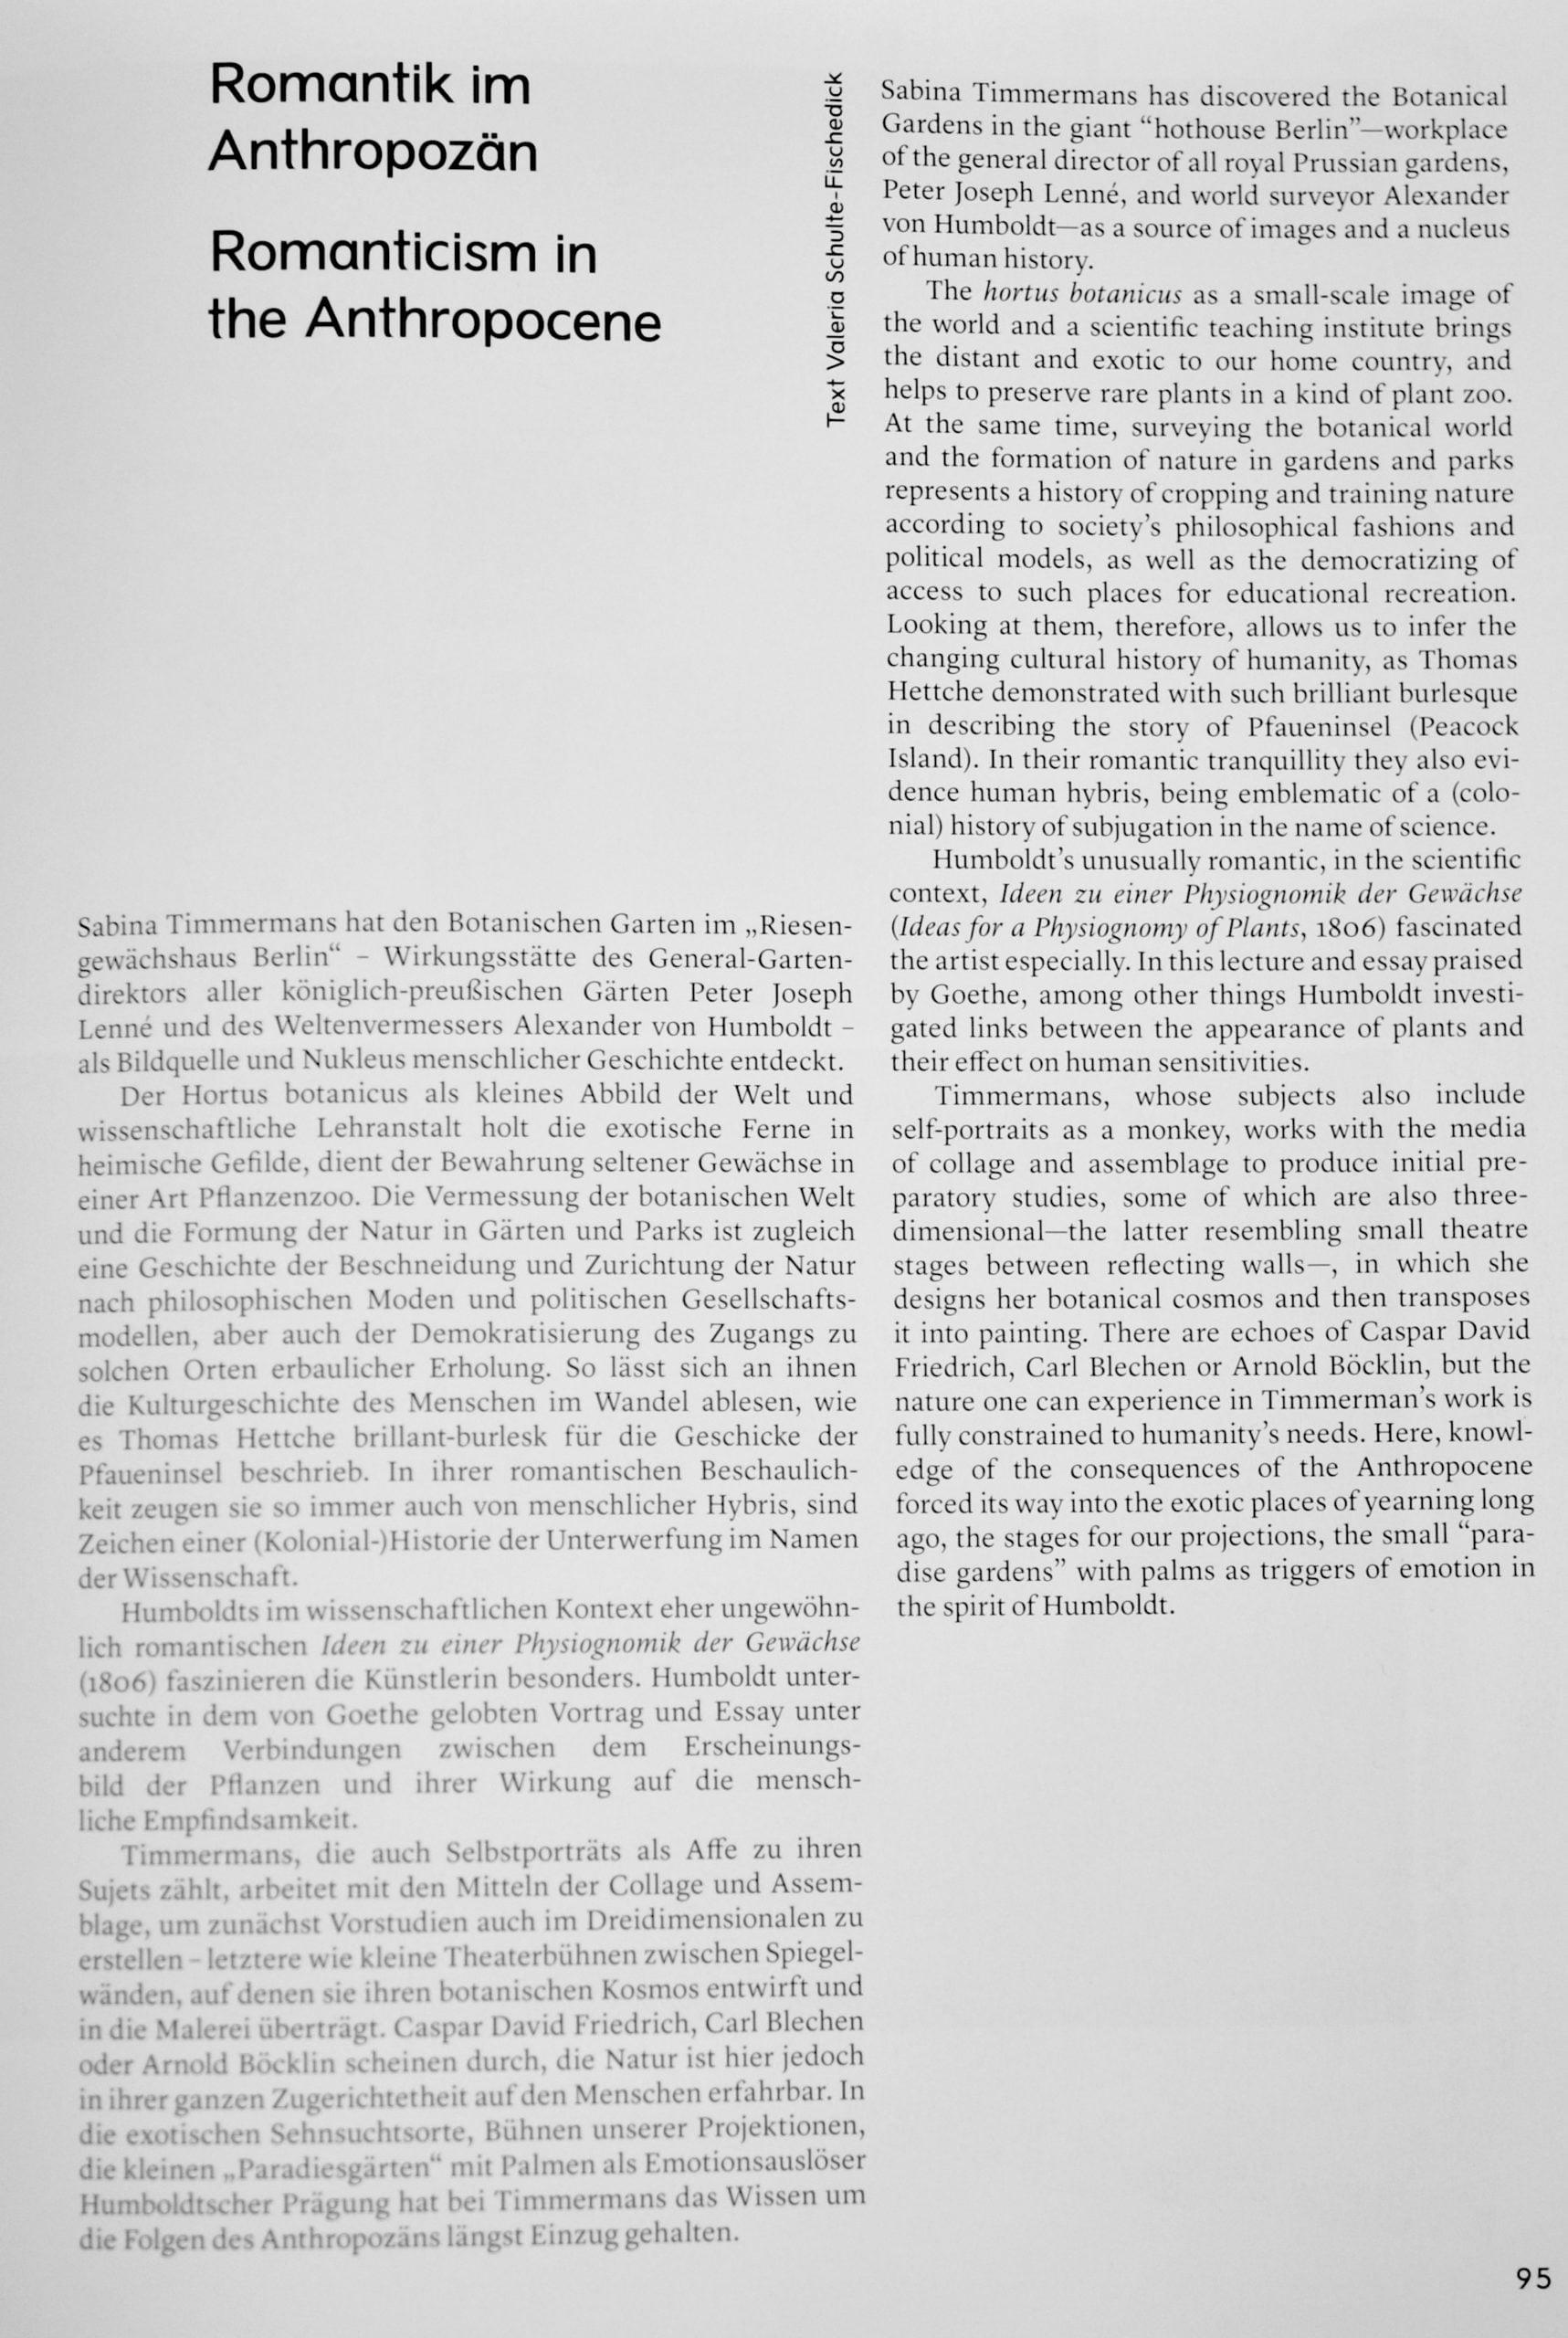 romanticism in the anthropocene by valeria schulte-fischedick